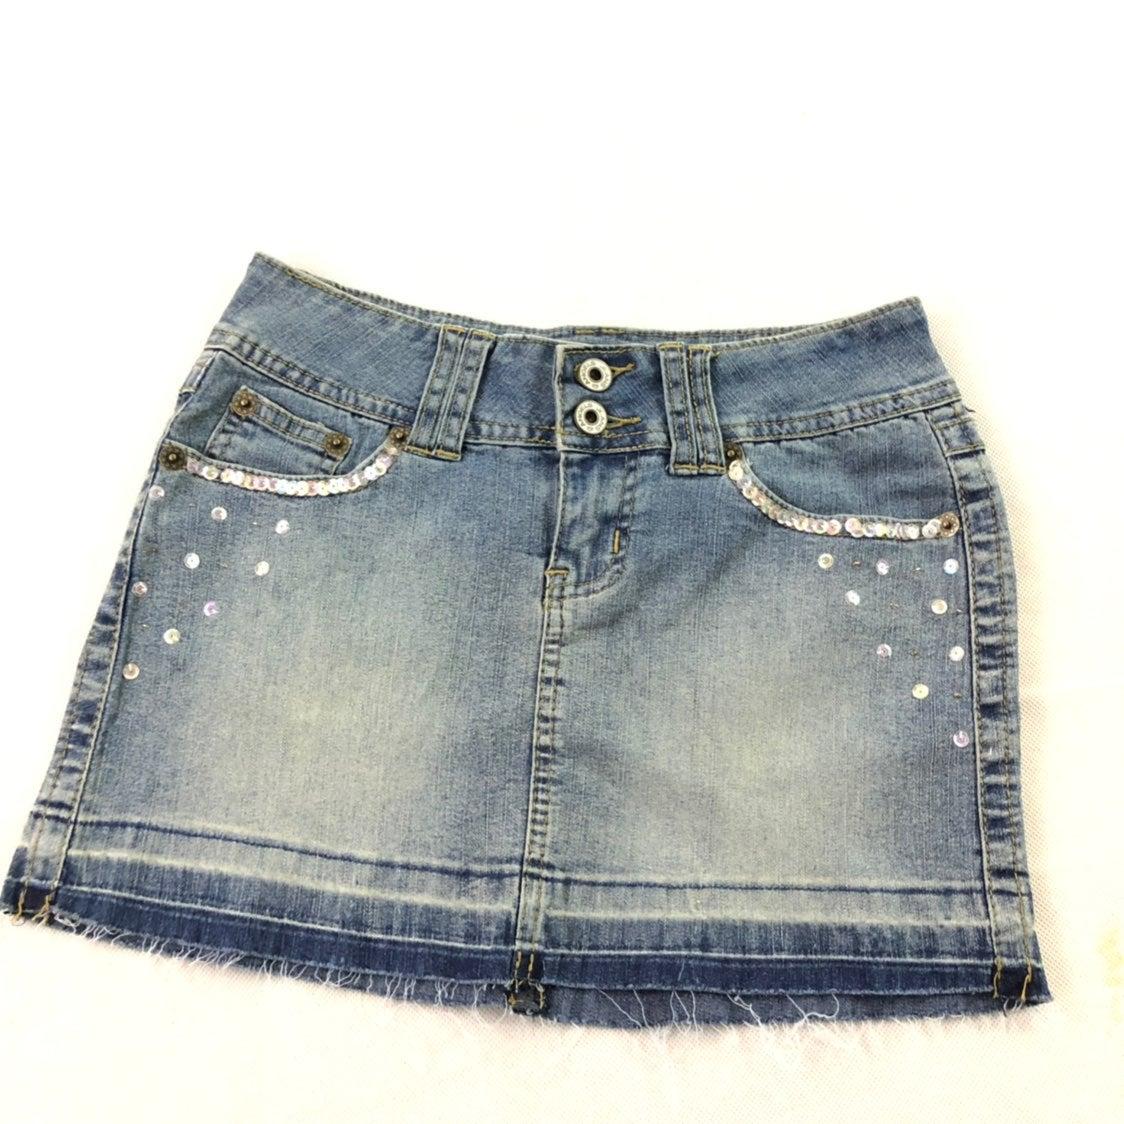 Angels Juniors Blue Jean Denim Skirt 1